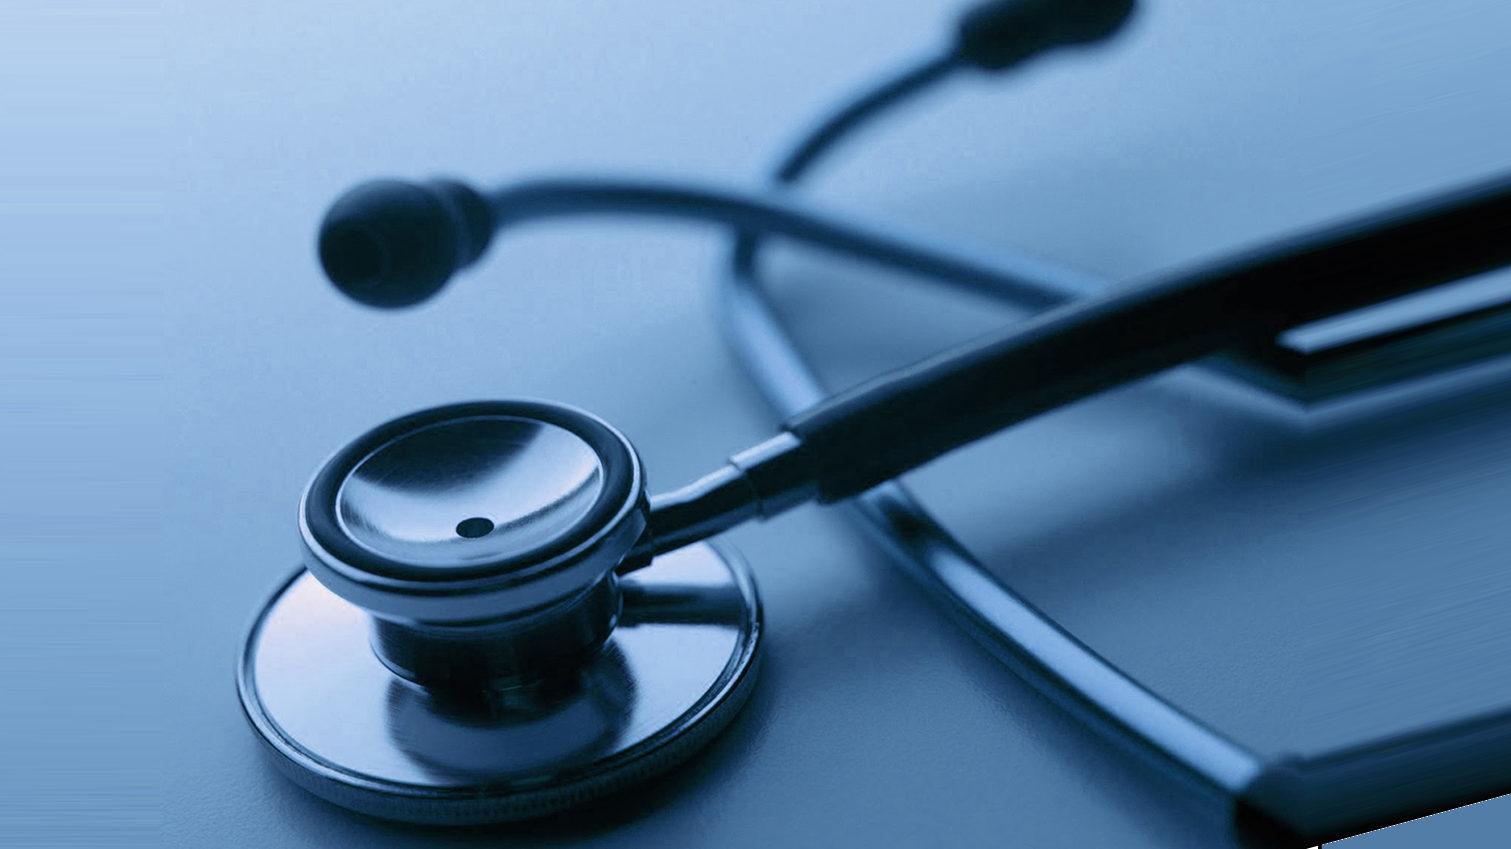 Difesa Responsabilità medica e sanitaria